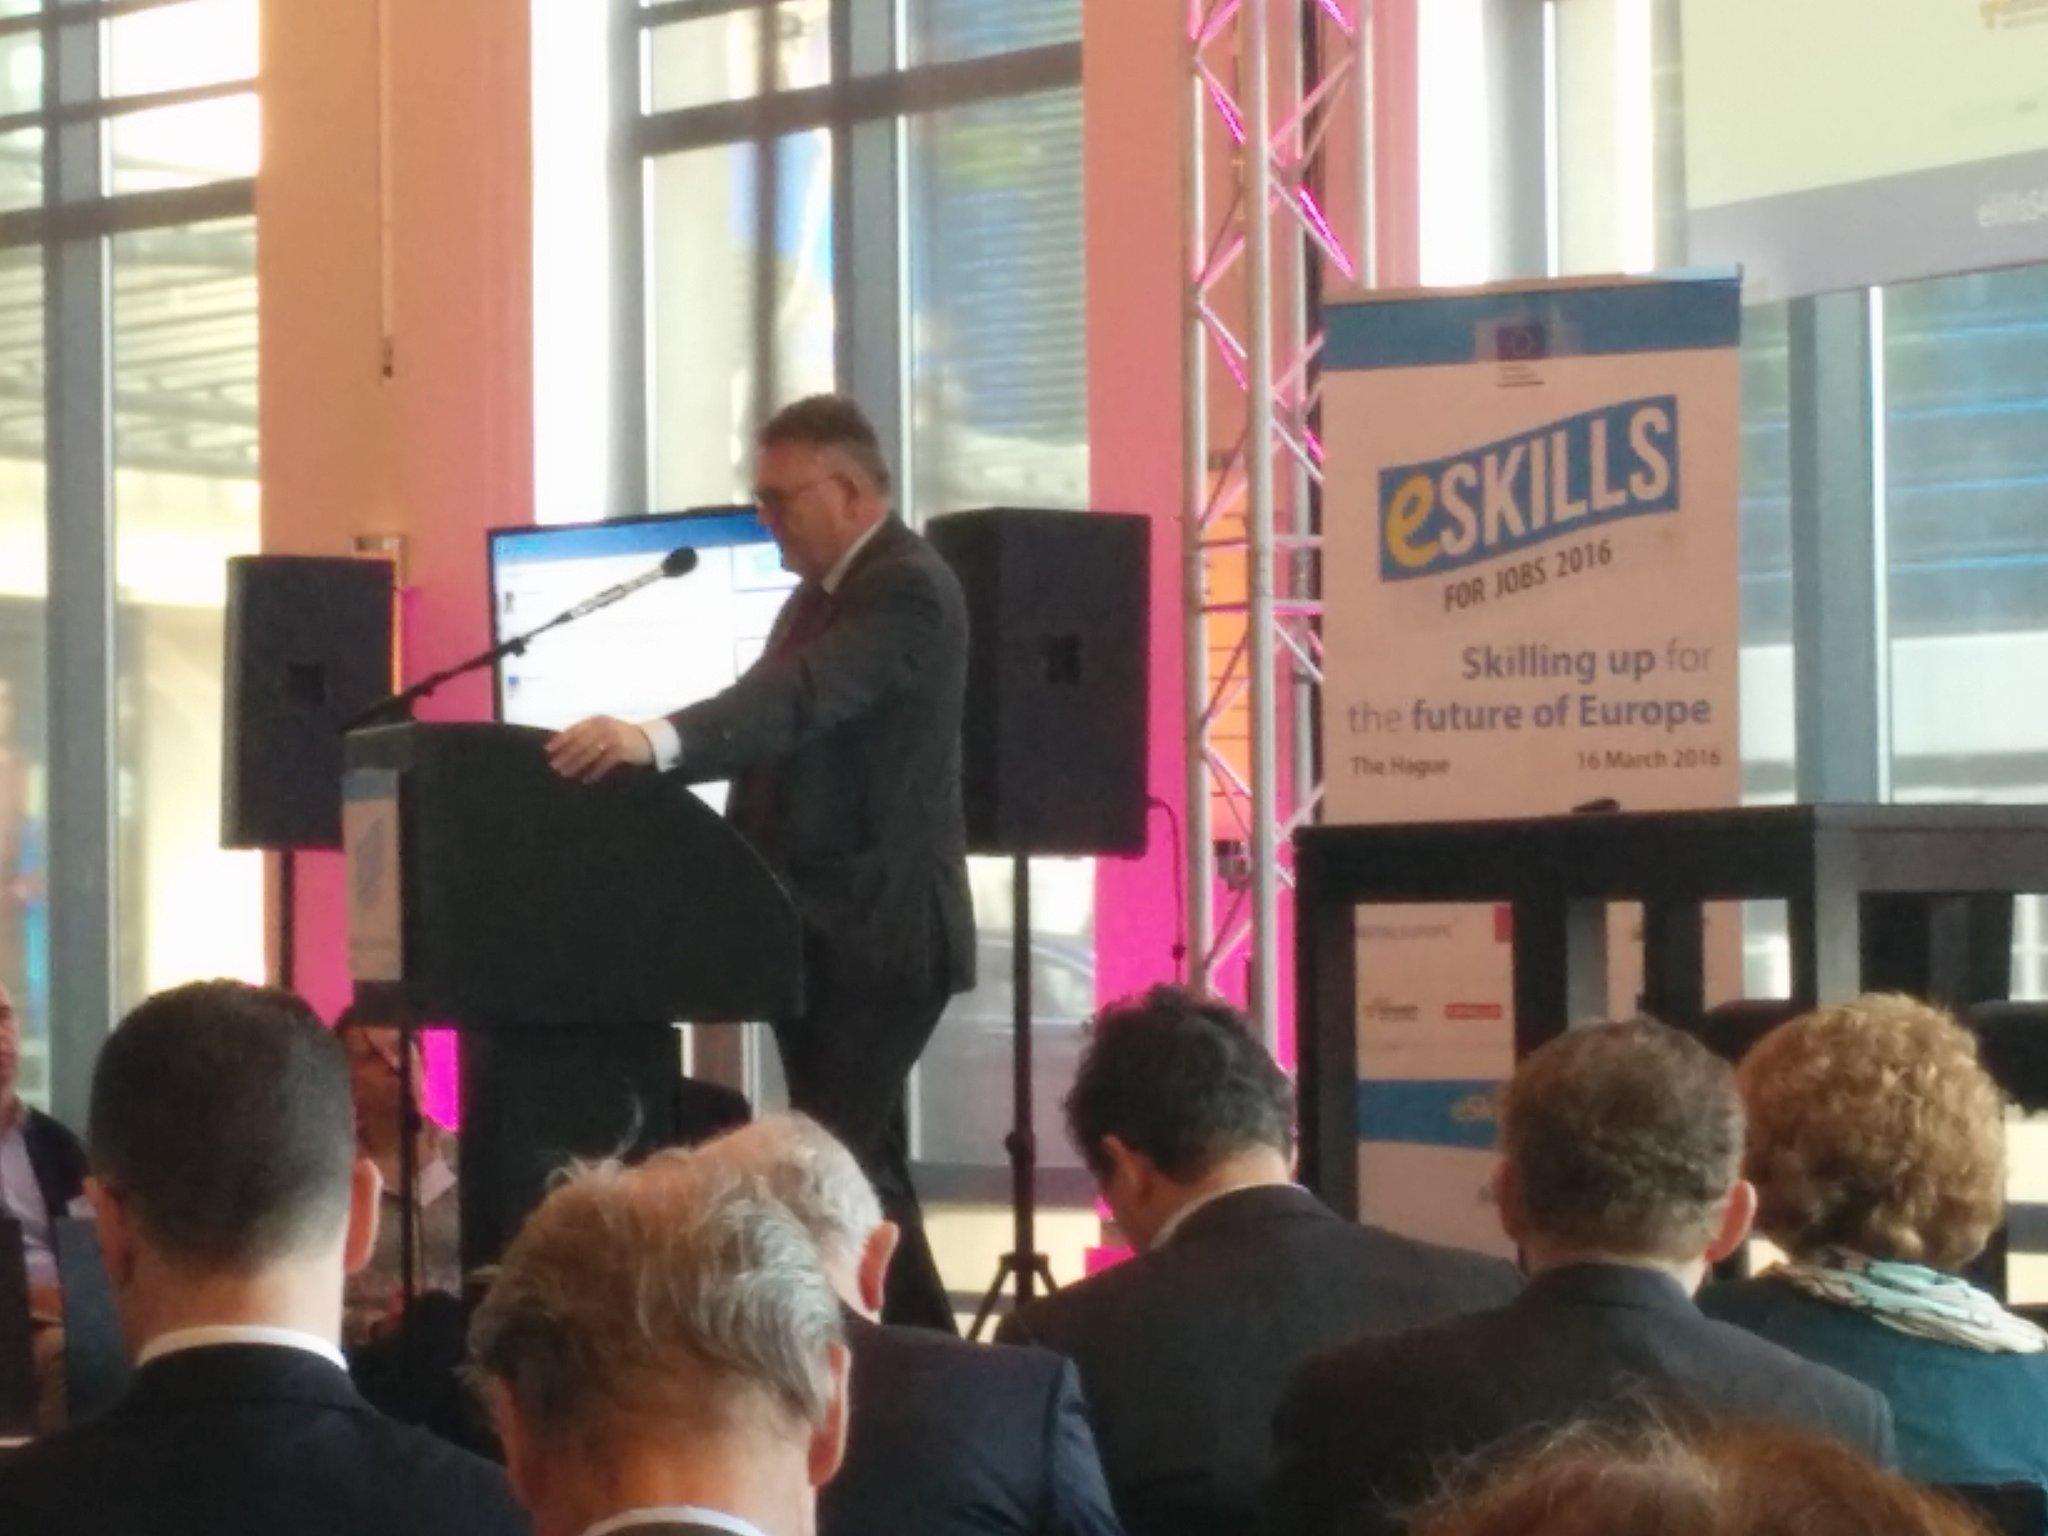 """Digital skills is the key for Europe's Renaissance to be inclusive"" @nicolasschmit2 at #eSkillsNL @eskills4jobs https://t.co/CXZ8c0IyhI"